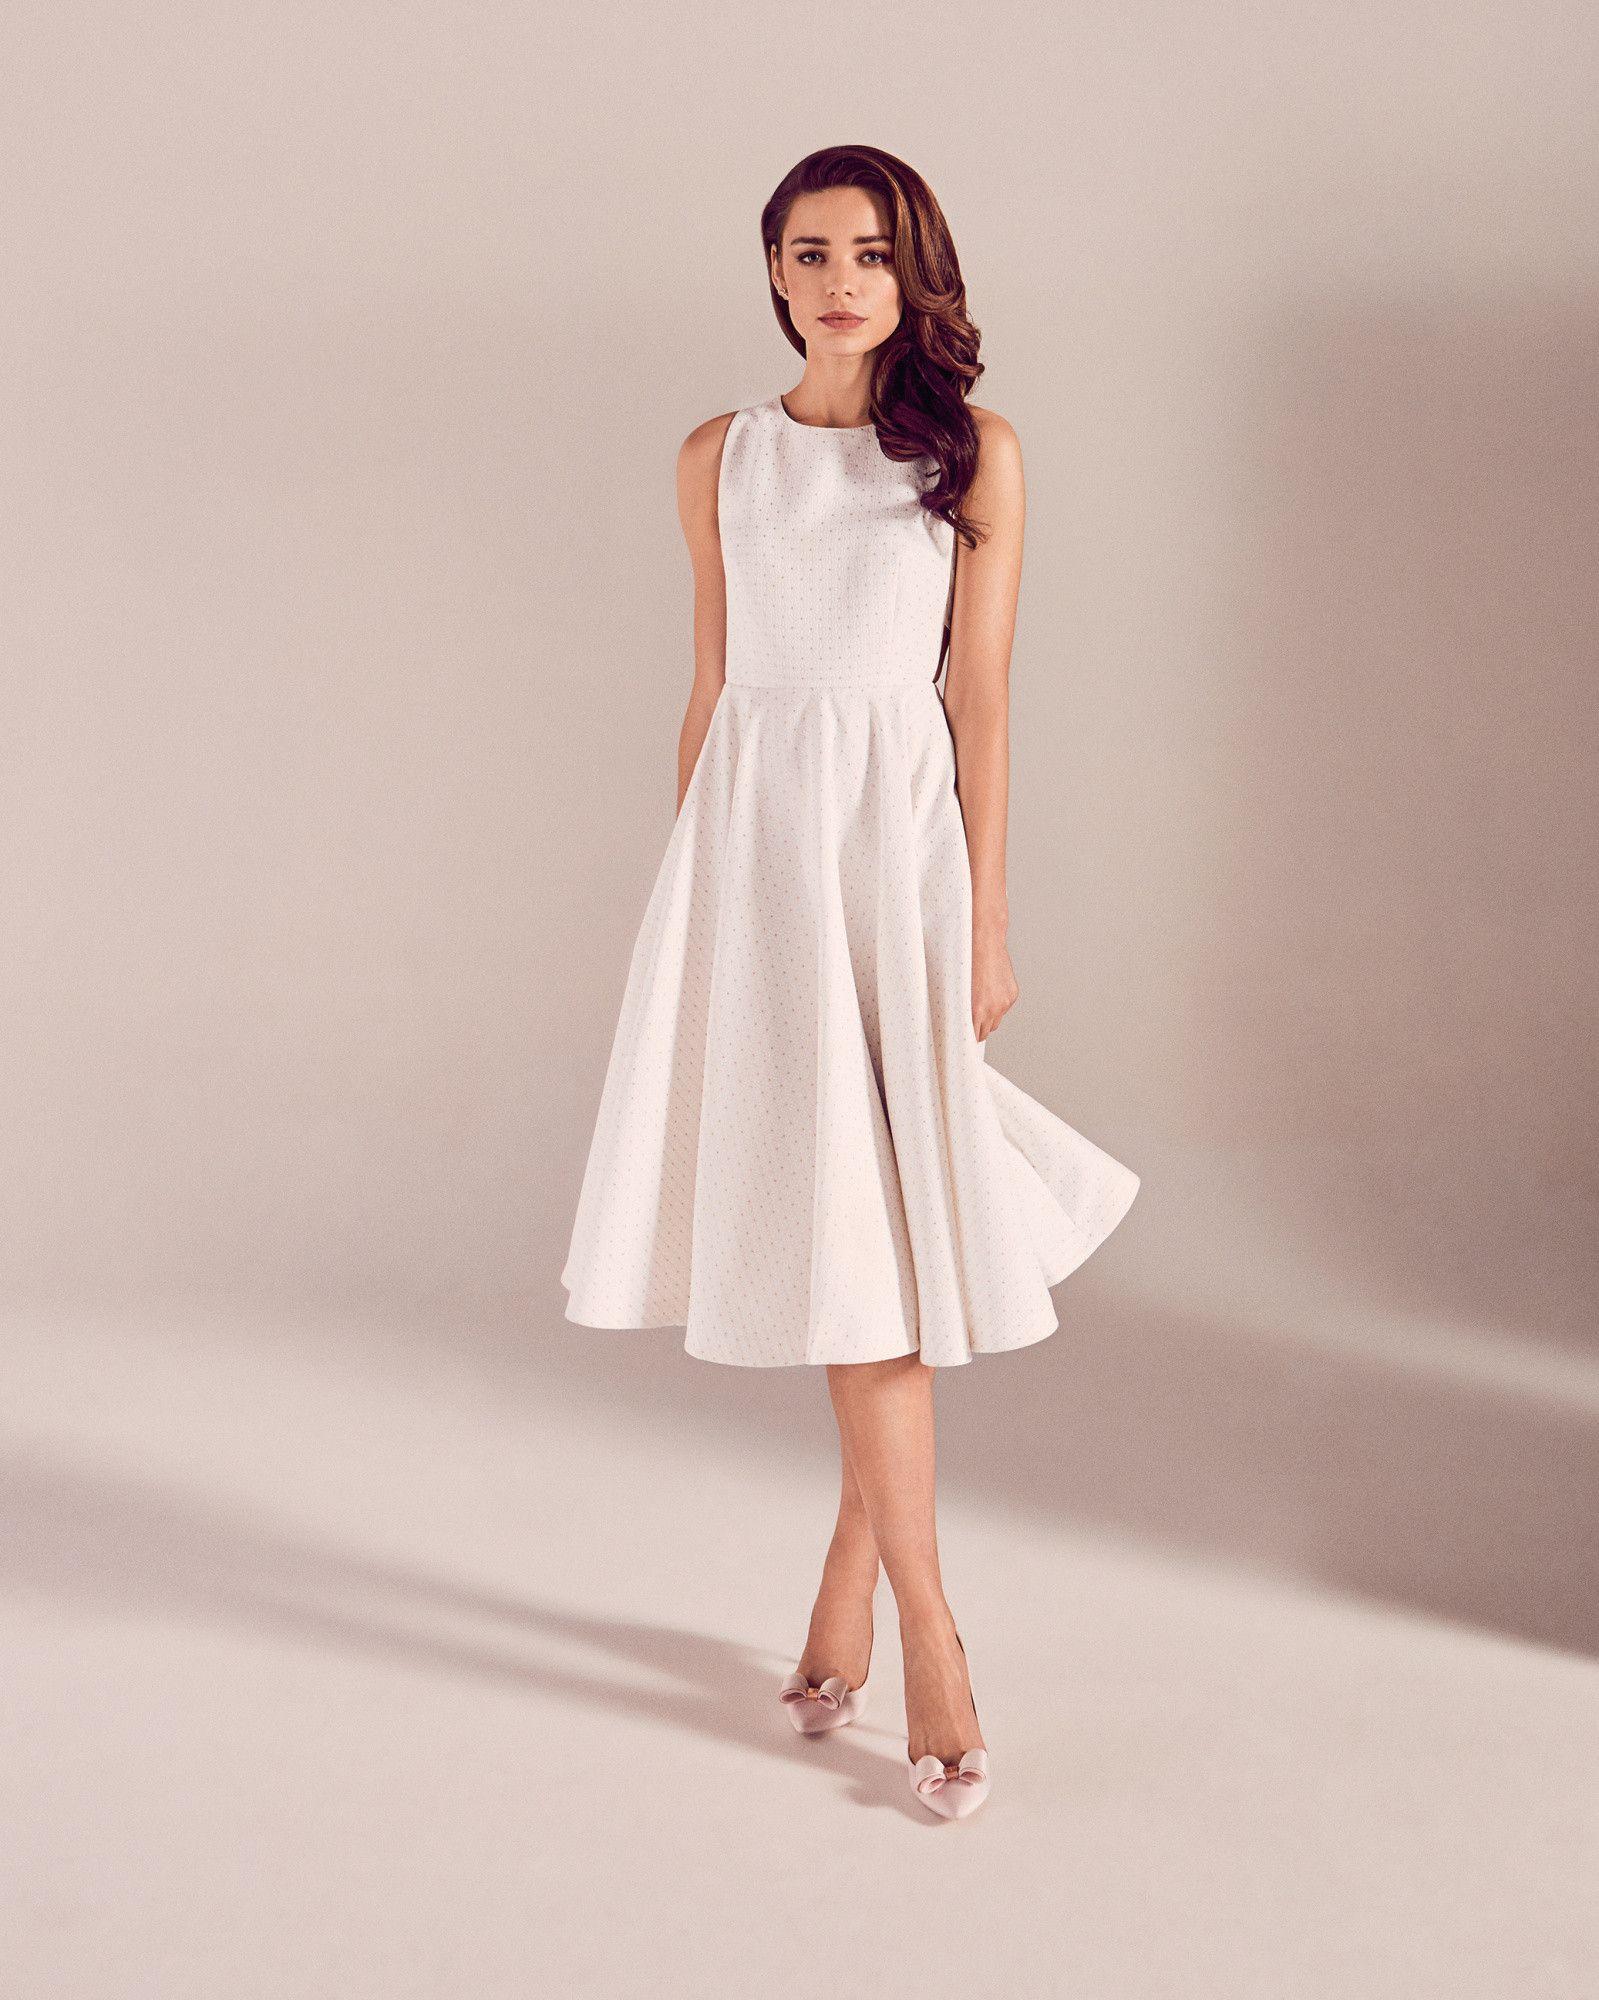 Daisy Jacquard Cut Out Midi Dress